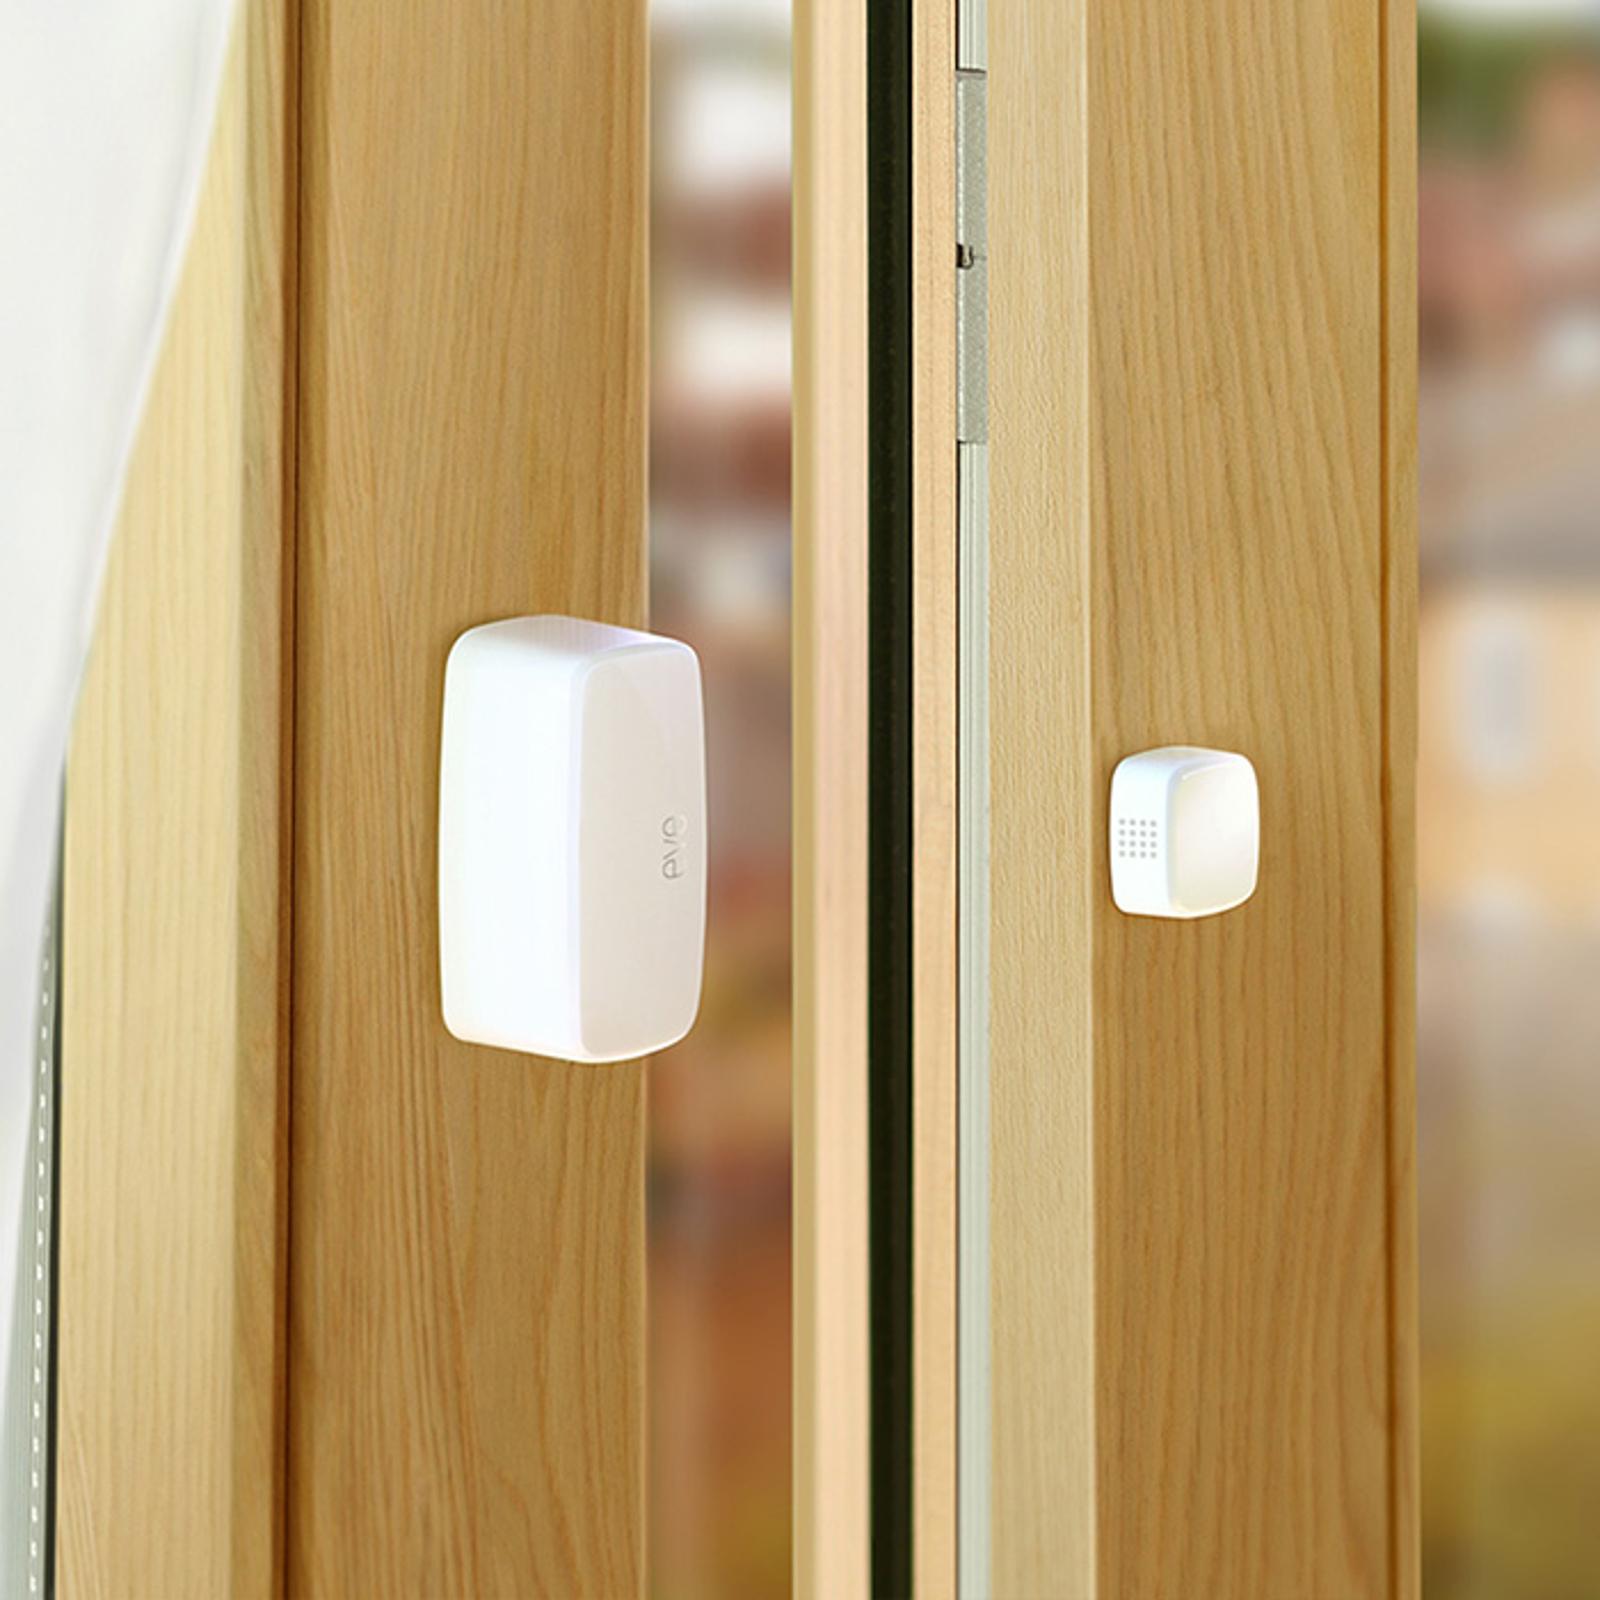 Eve Door & Window dør- og vindussensor smarthus